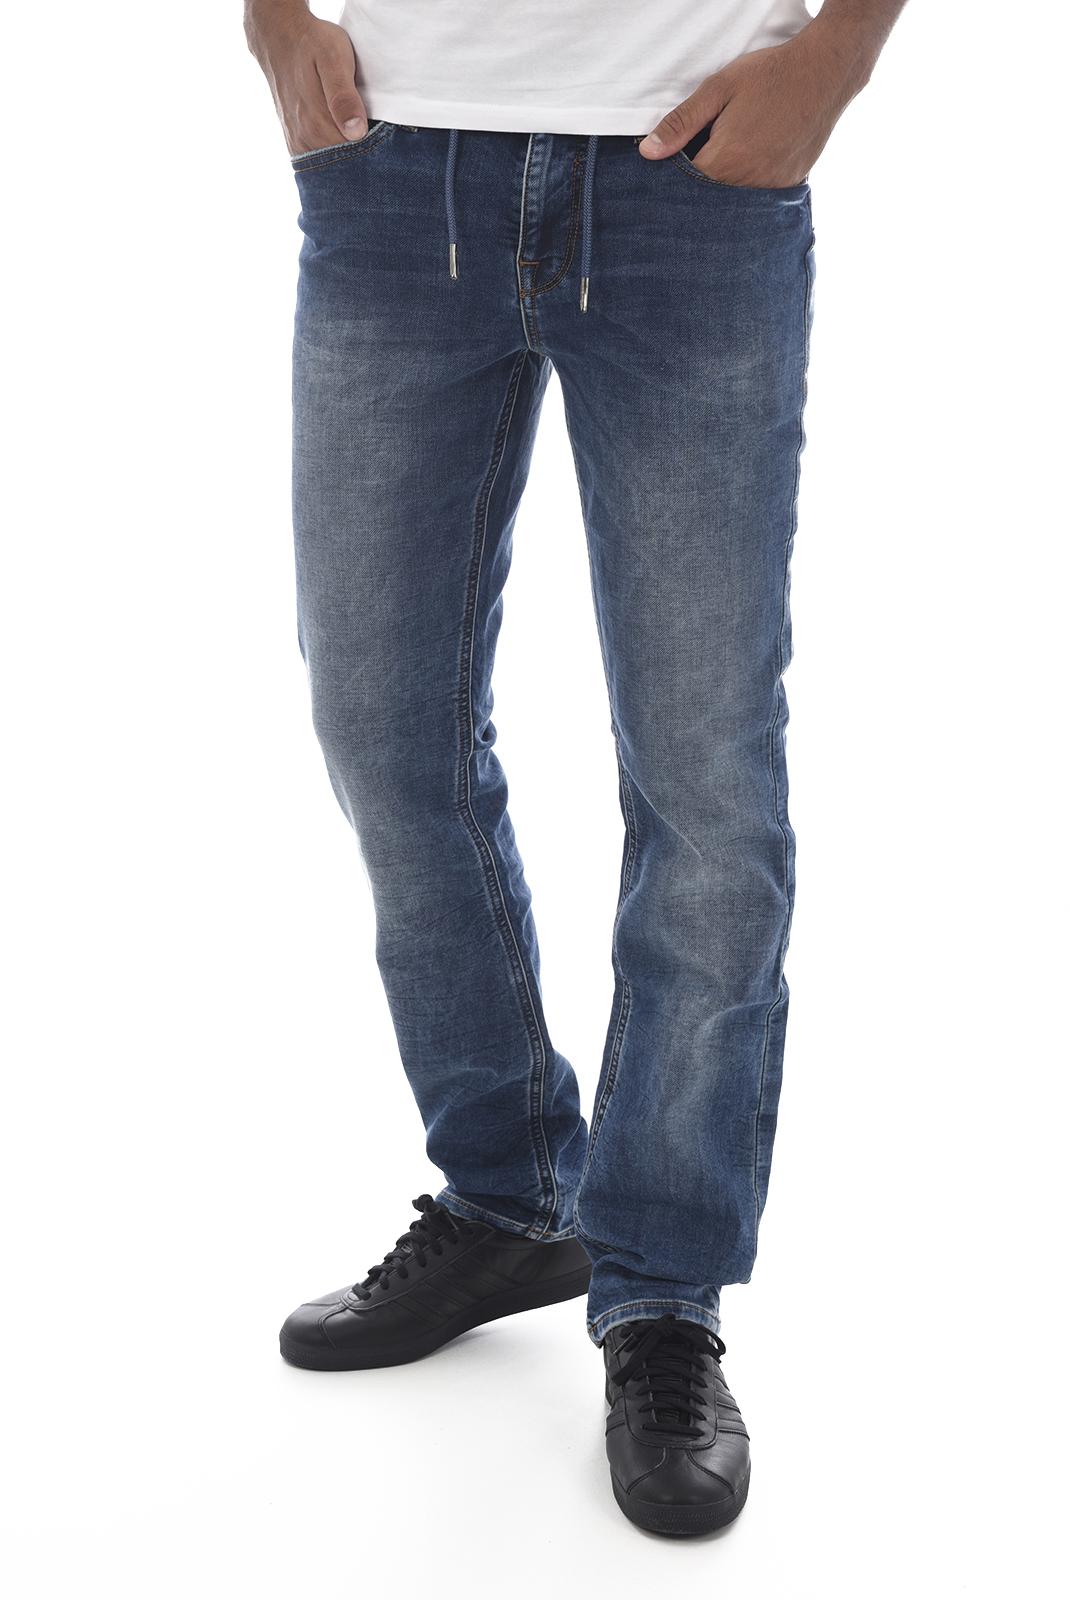 slim / skinny  Guess jeans M81A00 D2RF2 SLANG